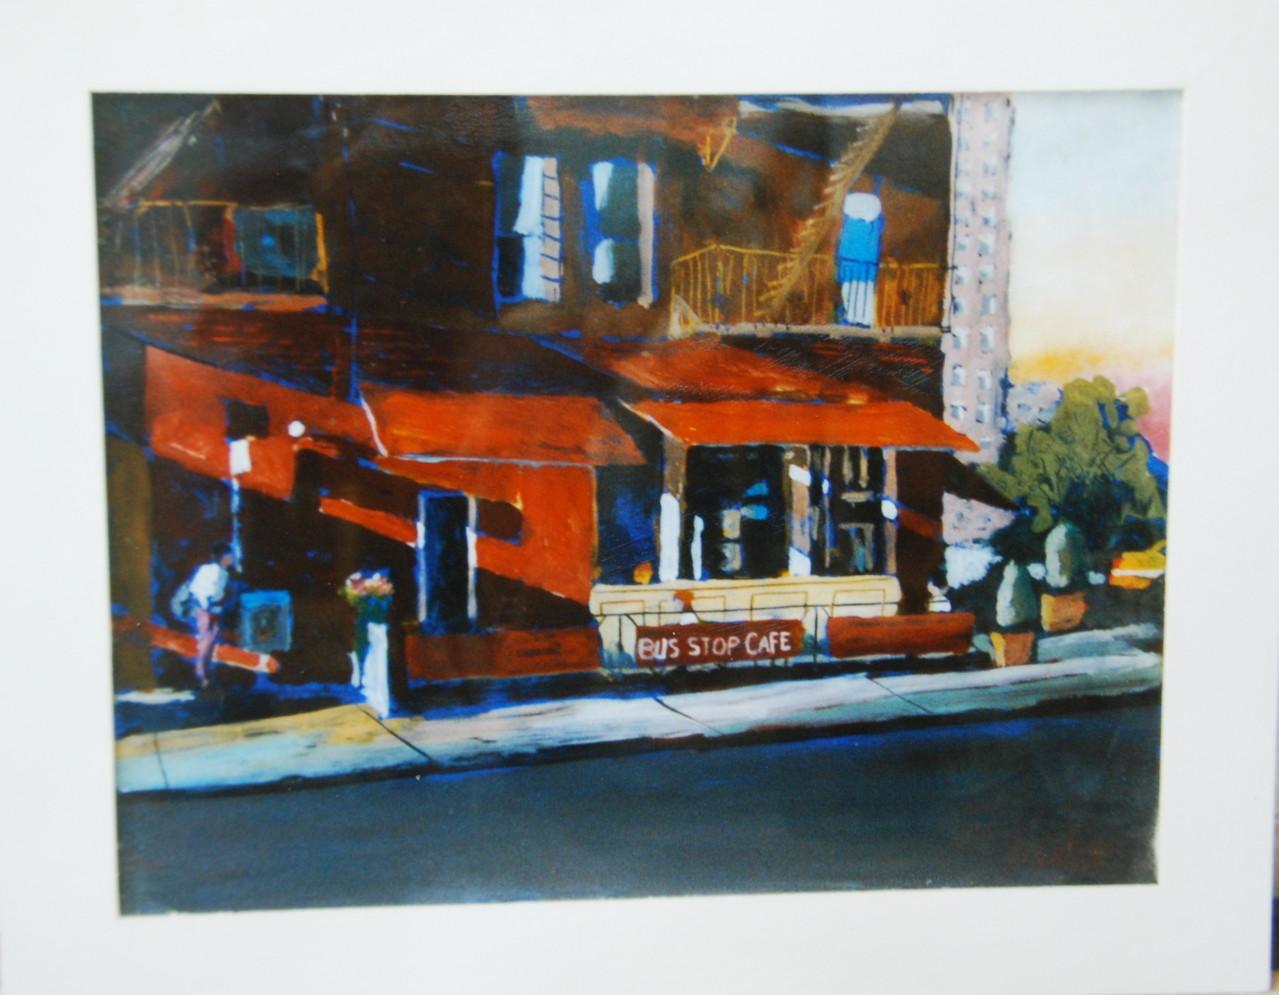 Bus Stop Cafe, 1998,Hinterglasmalerei, Privatsammlung